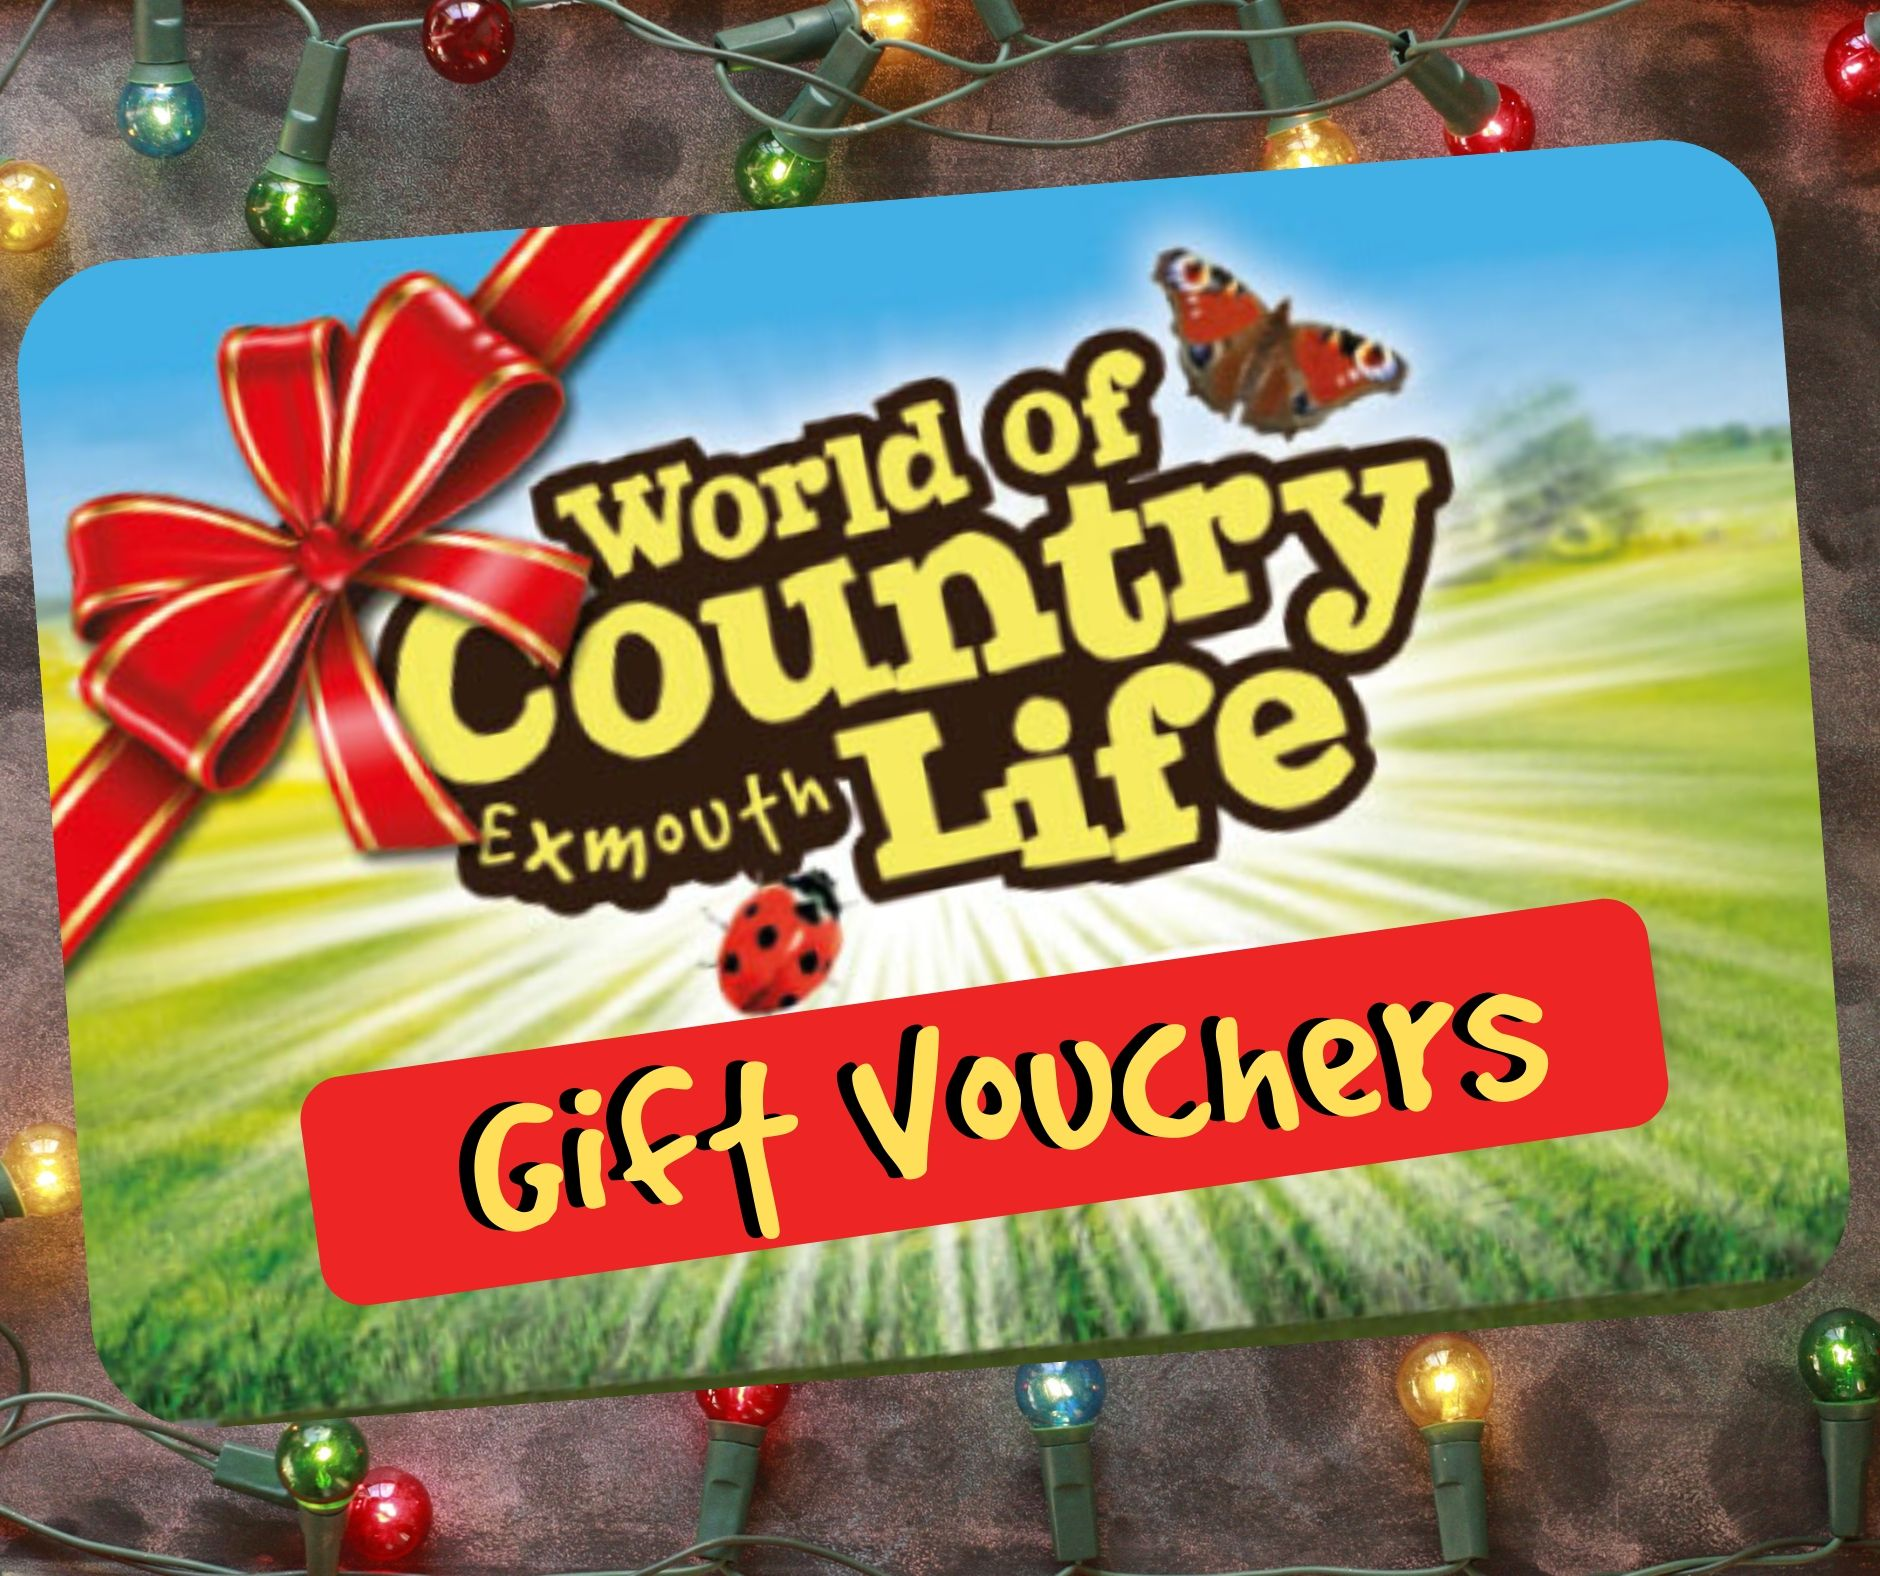 WOCL Gift vouchers